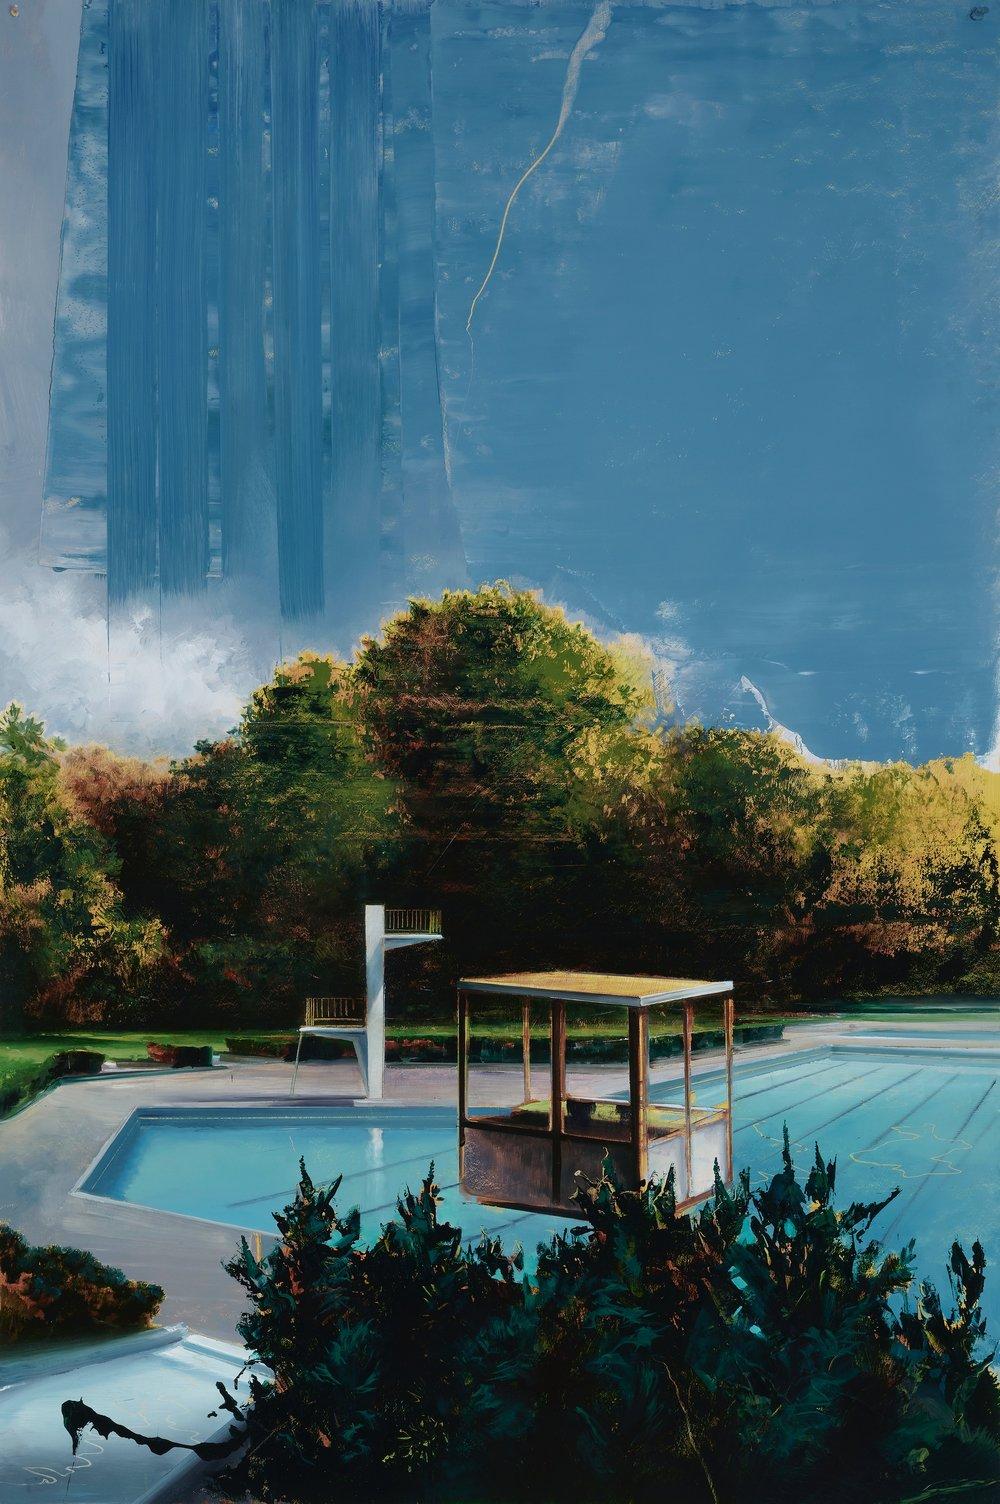 Goethe#3/Pool (1713)